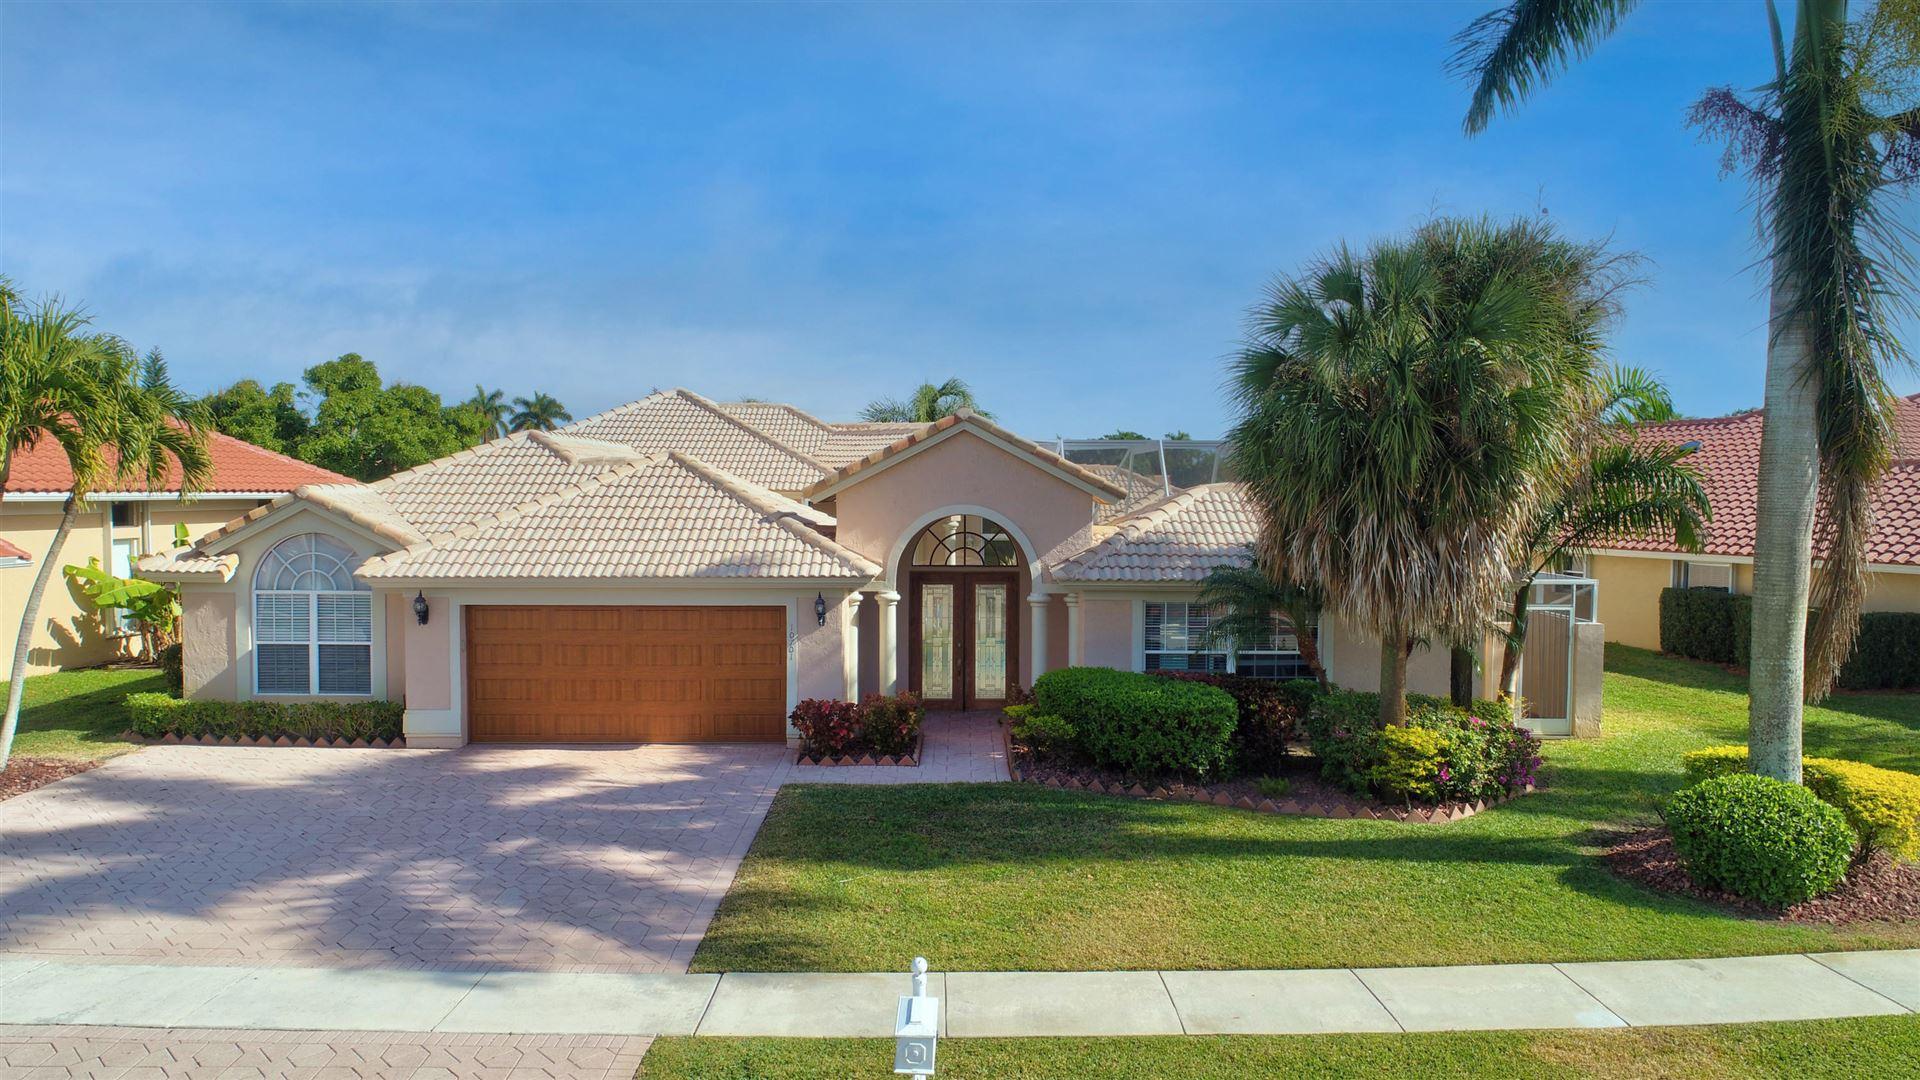 10701 Maple Chase Drive, Boca Raton, FL 33498 - #: RX-10686287